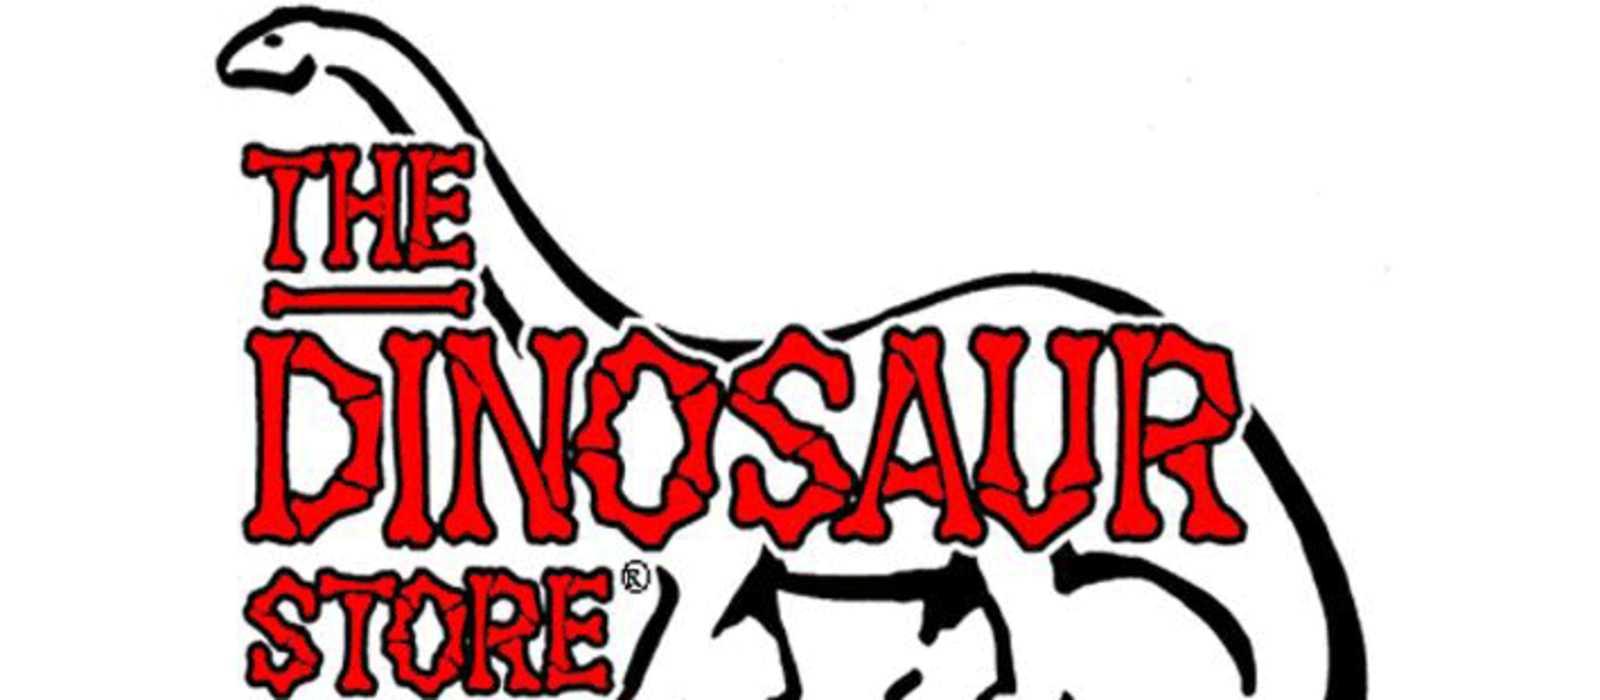 Dinosaur Store, Cocoa Beach